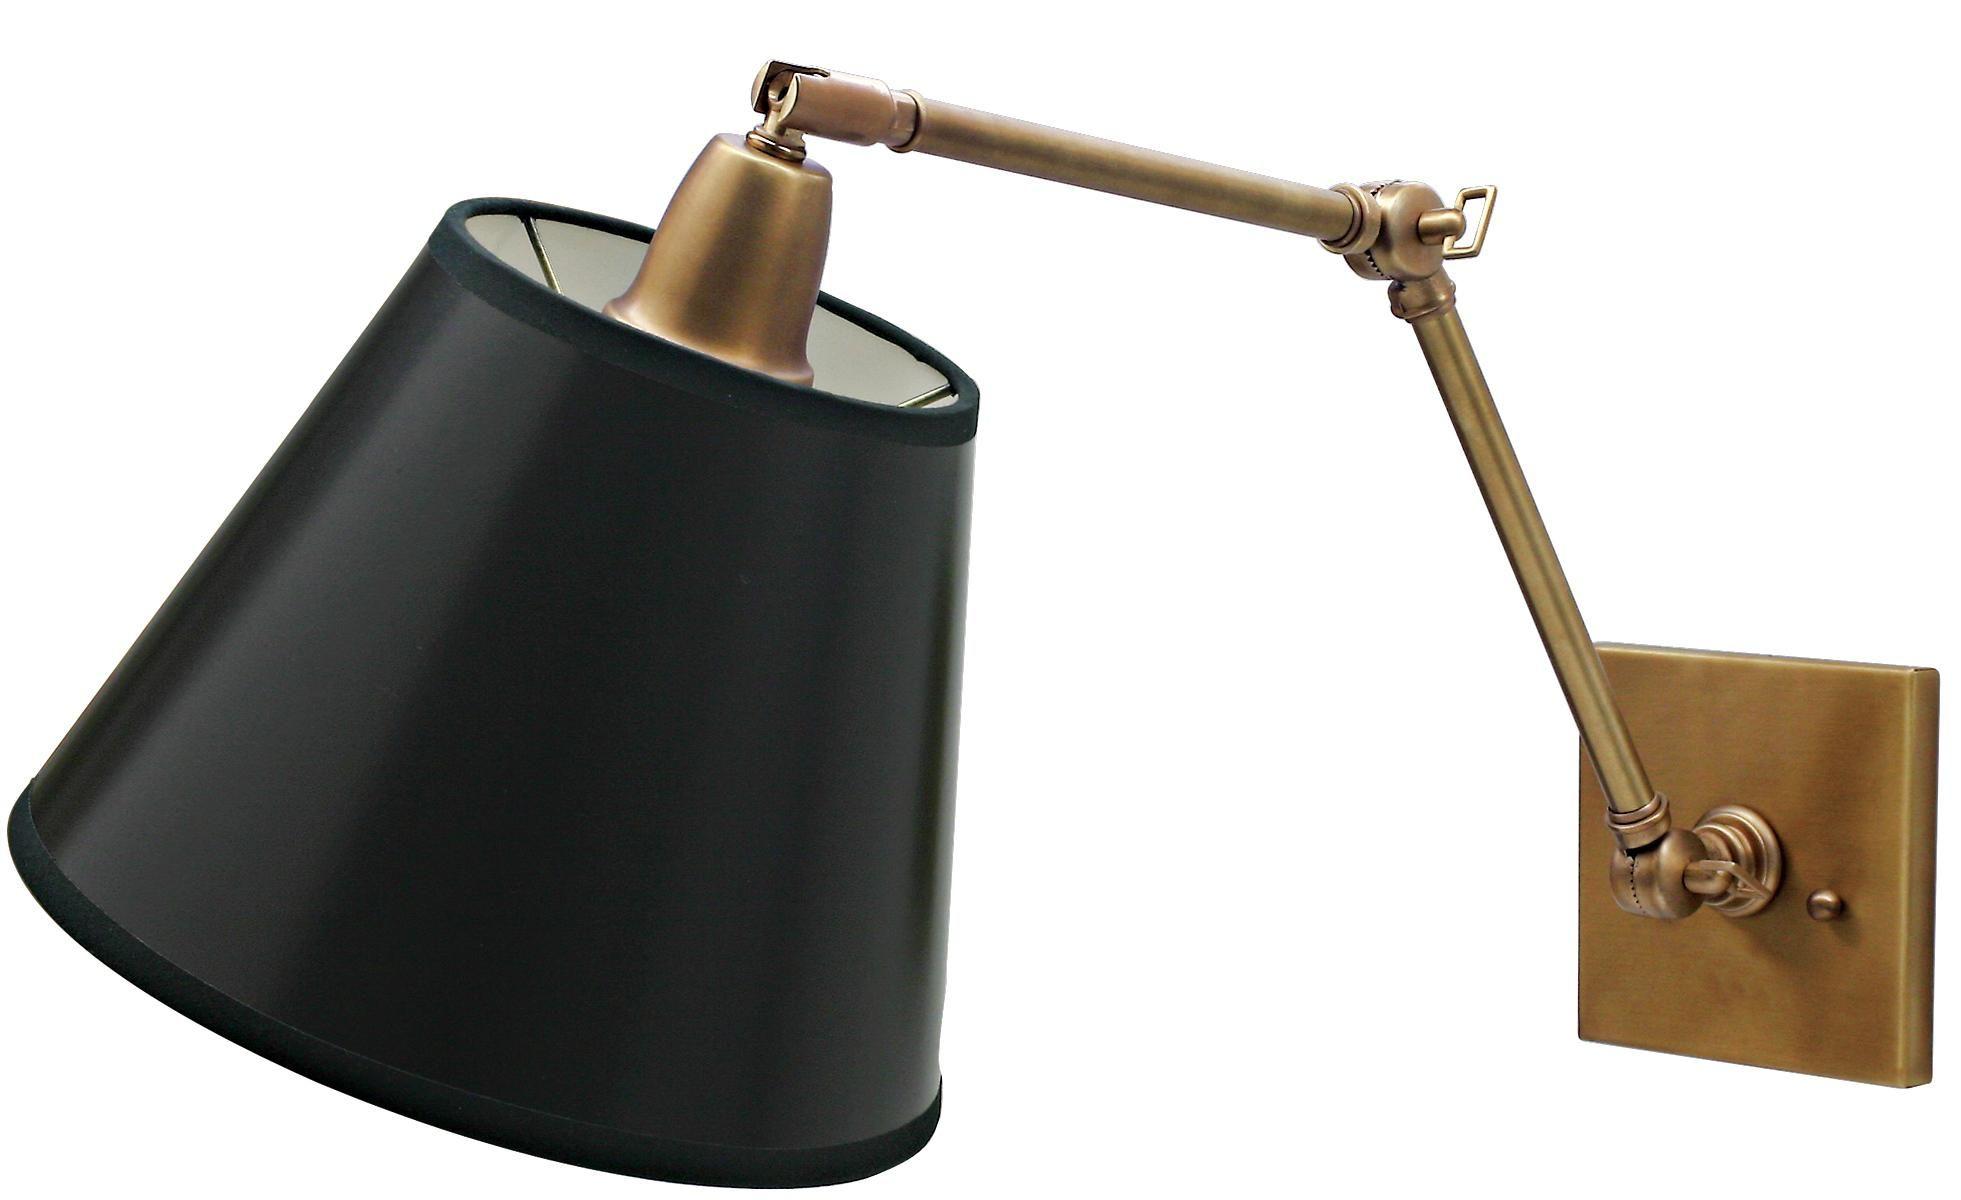 Koleman Swing Arm Wall Sconce Antique Brass Swing Arm Wall Sconce Sconces Candle Wall Sconces